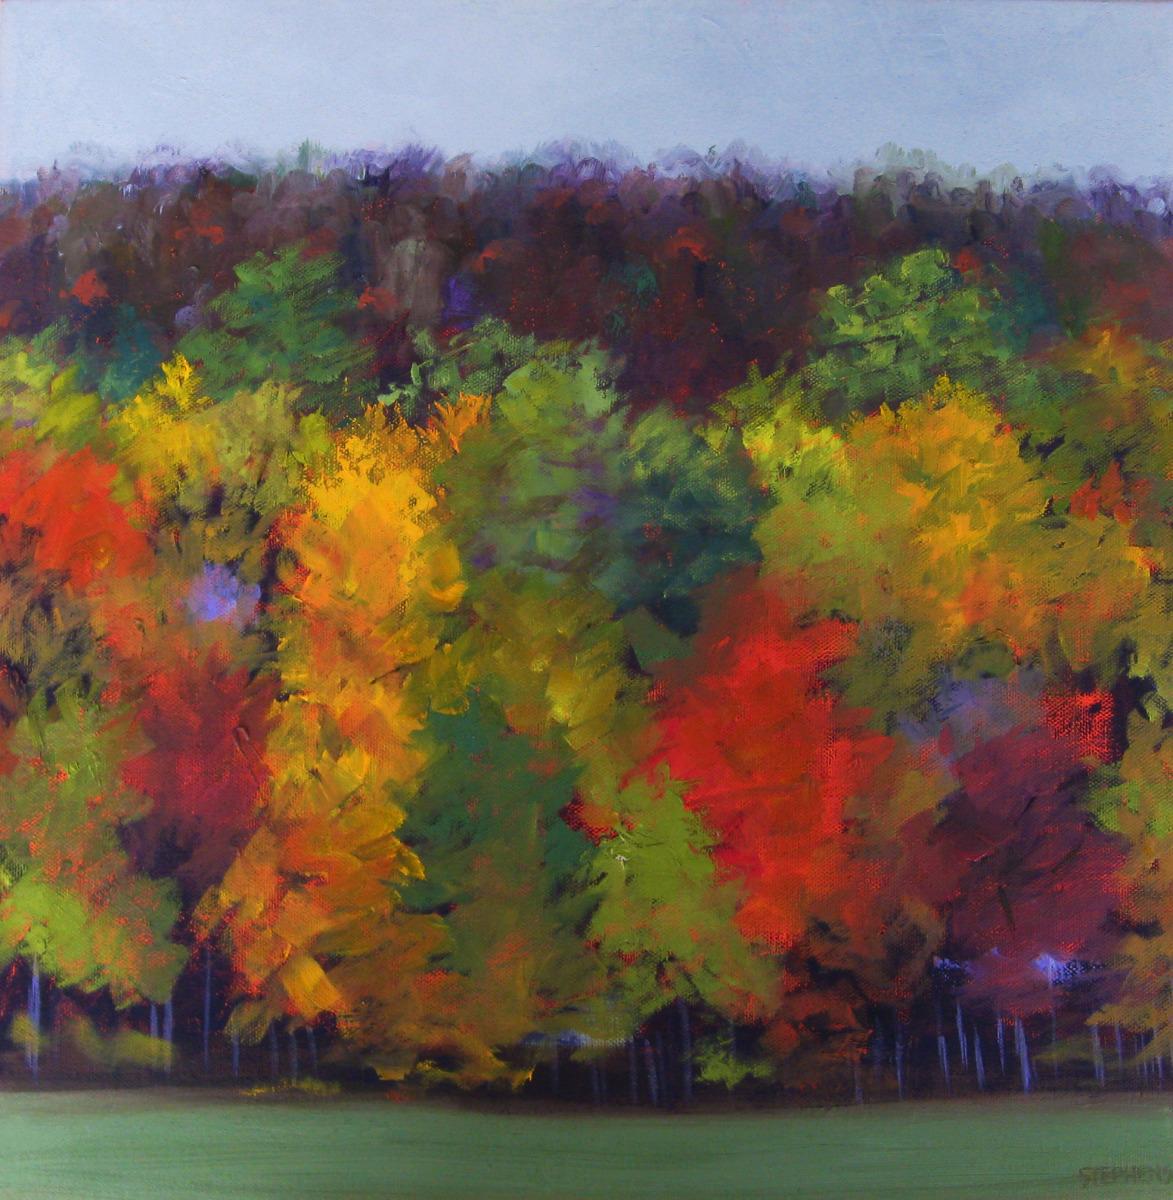 Autumn Impressions (large view)